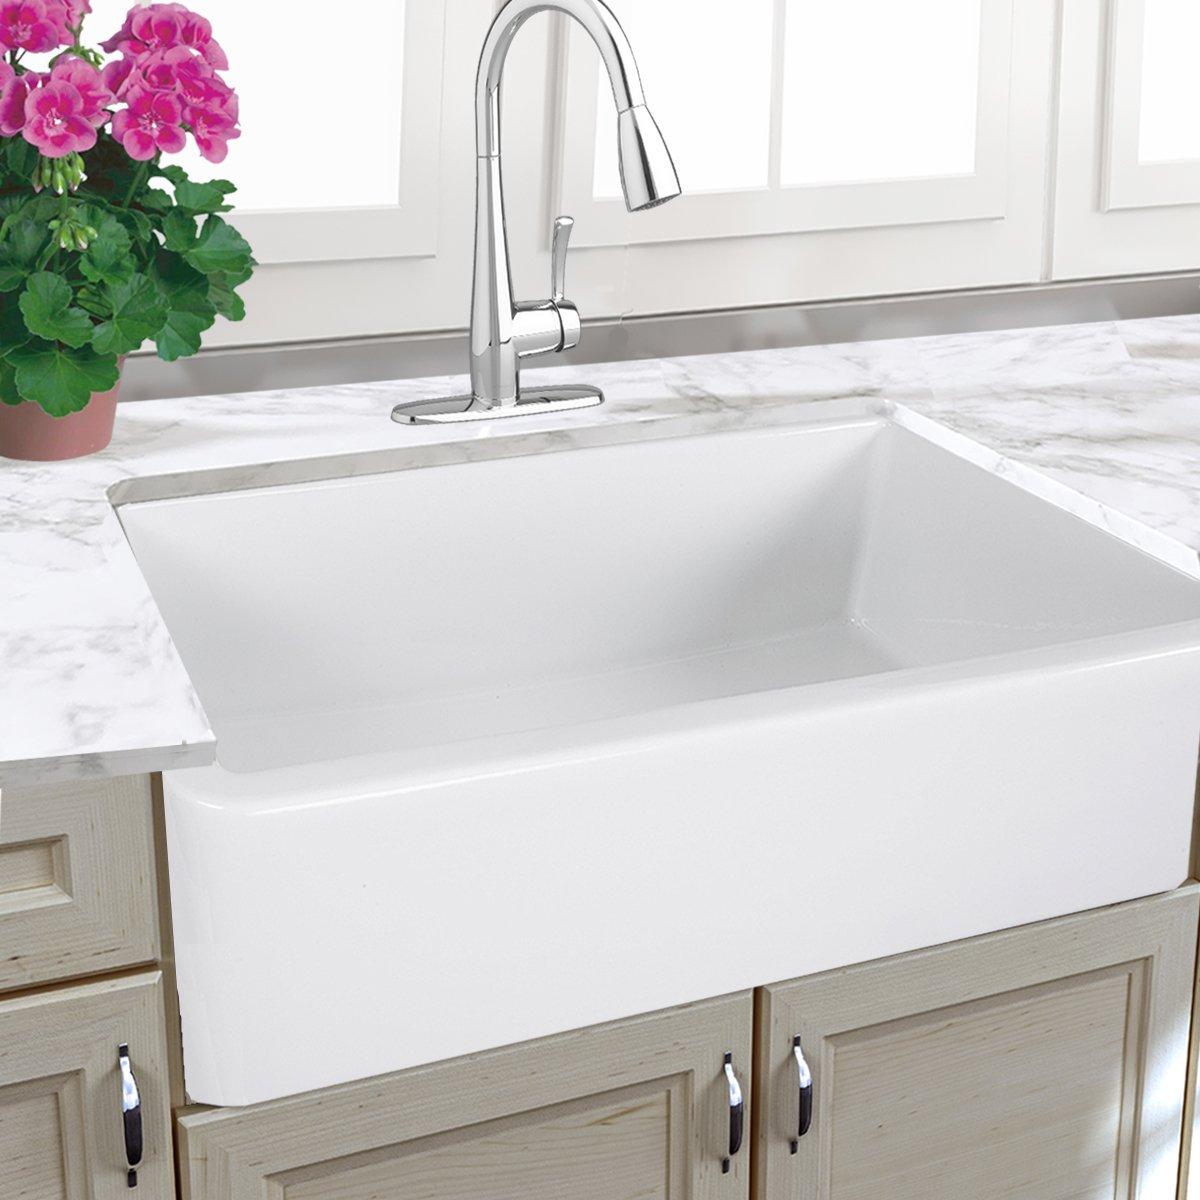 Kitchen Sink Keeps Backing Up: Loretta J. Willis, DESIGNER